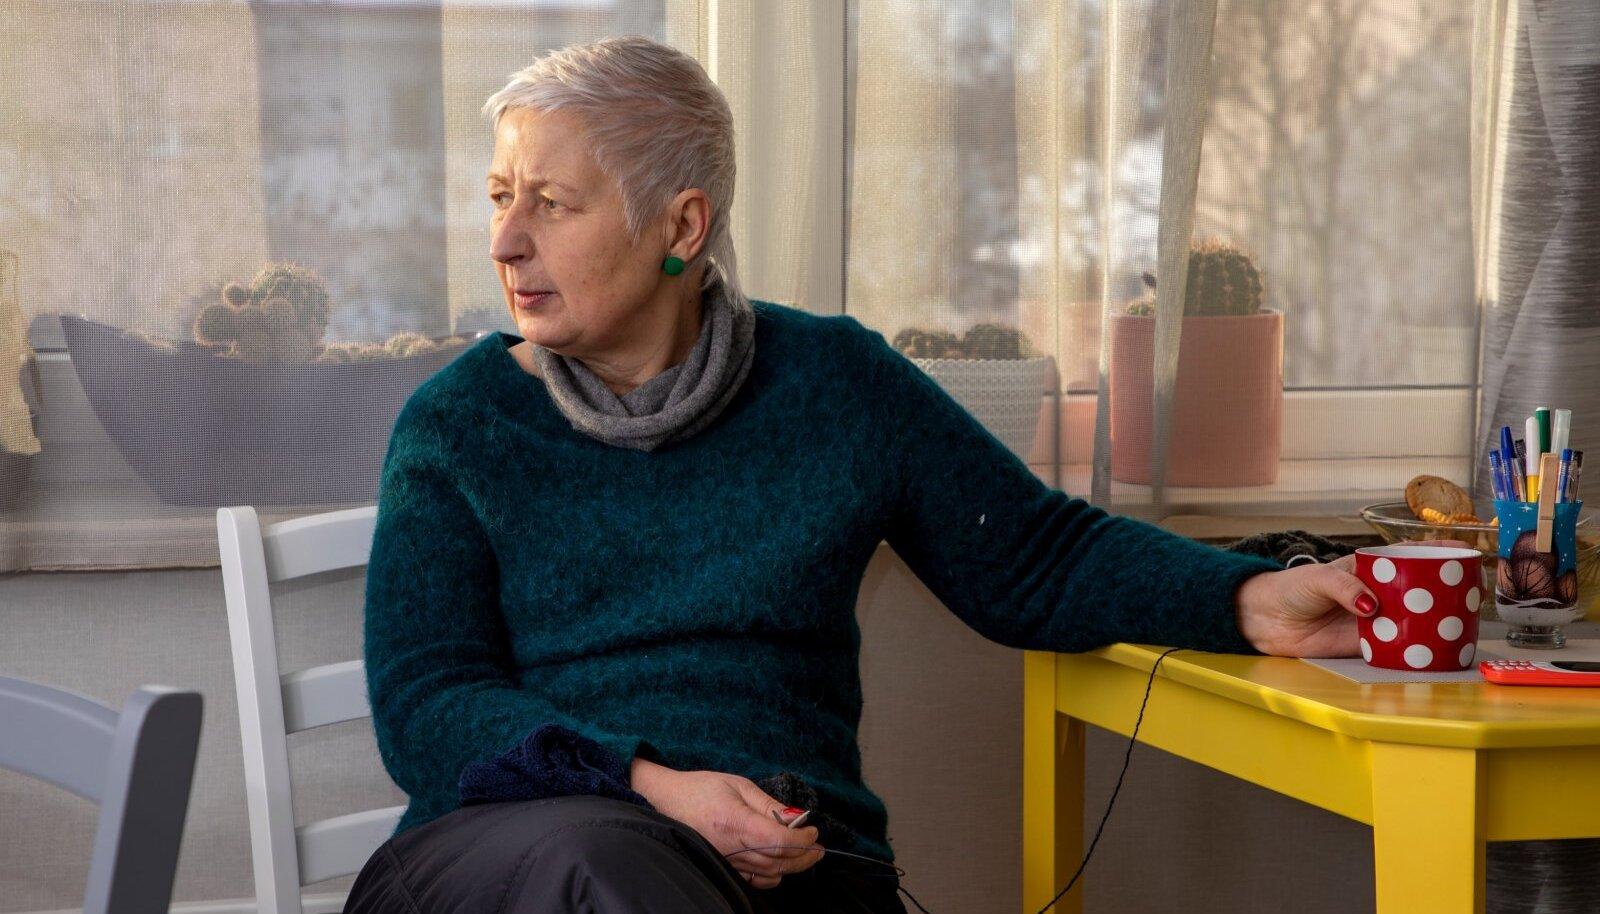 Margo Orupõld - Pärnu naiste tugikeskus